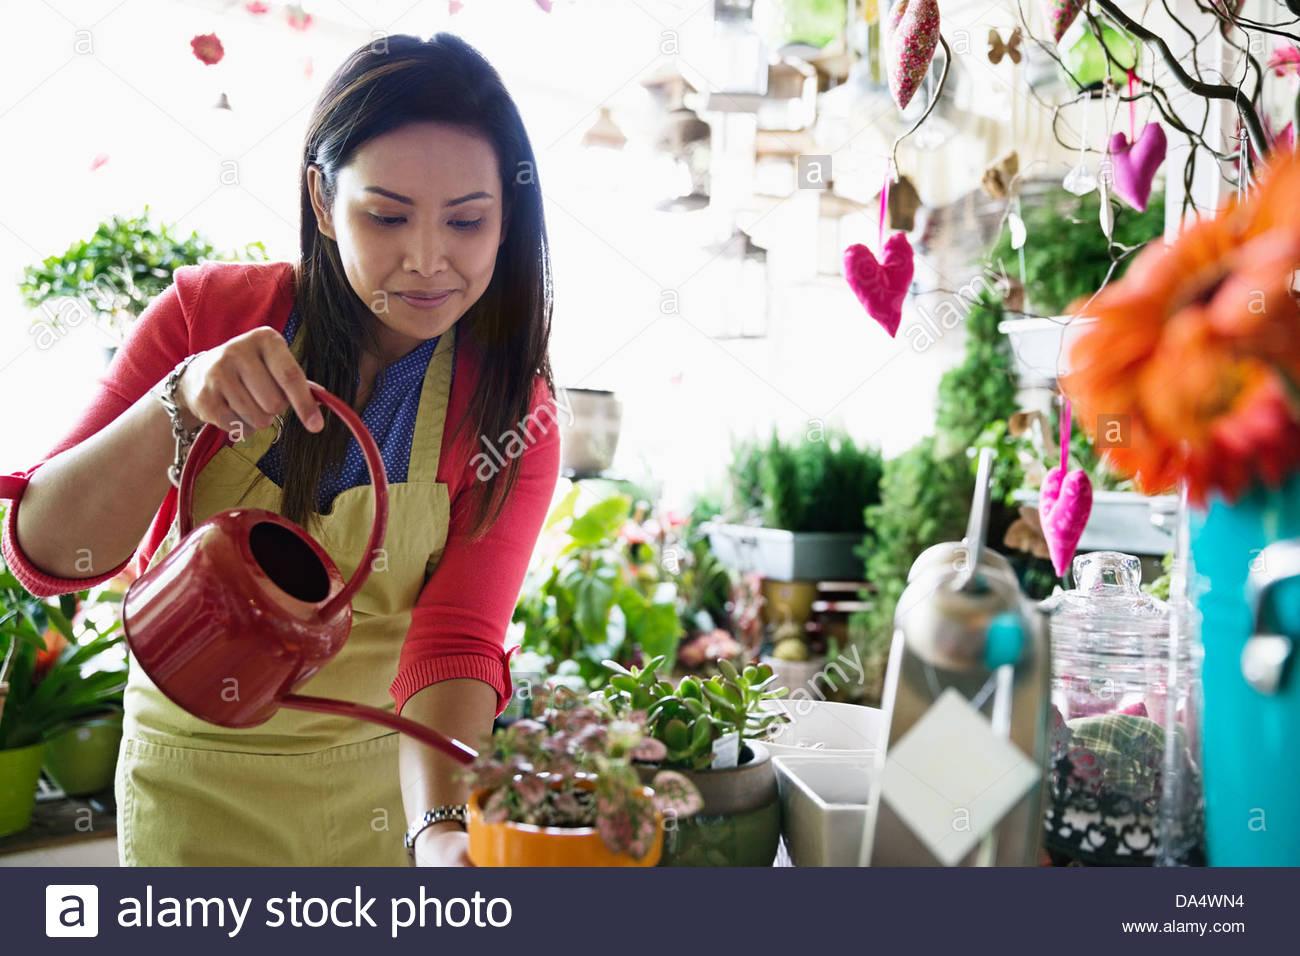 Female florist watering plants in flower shop - Stock Image